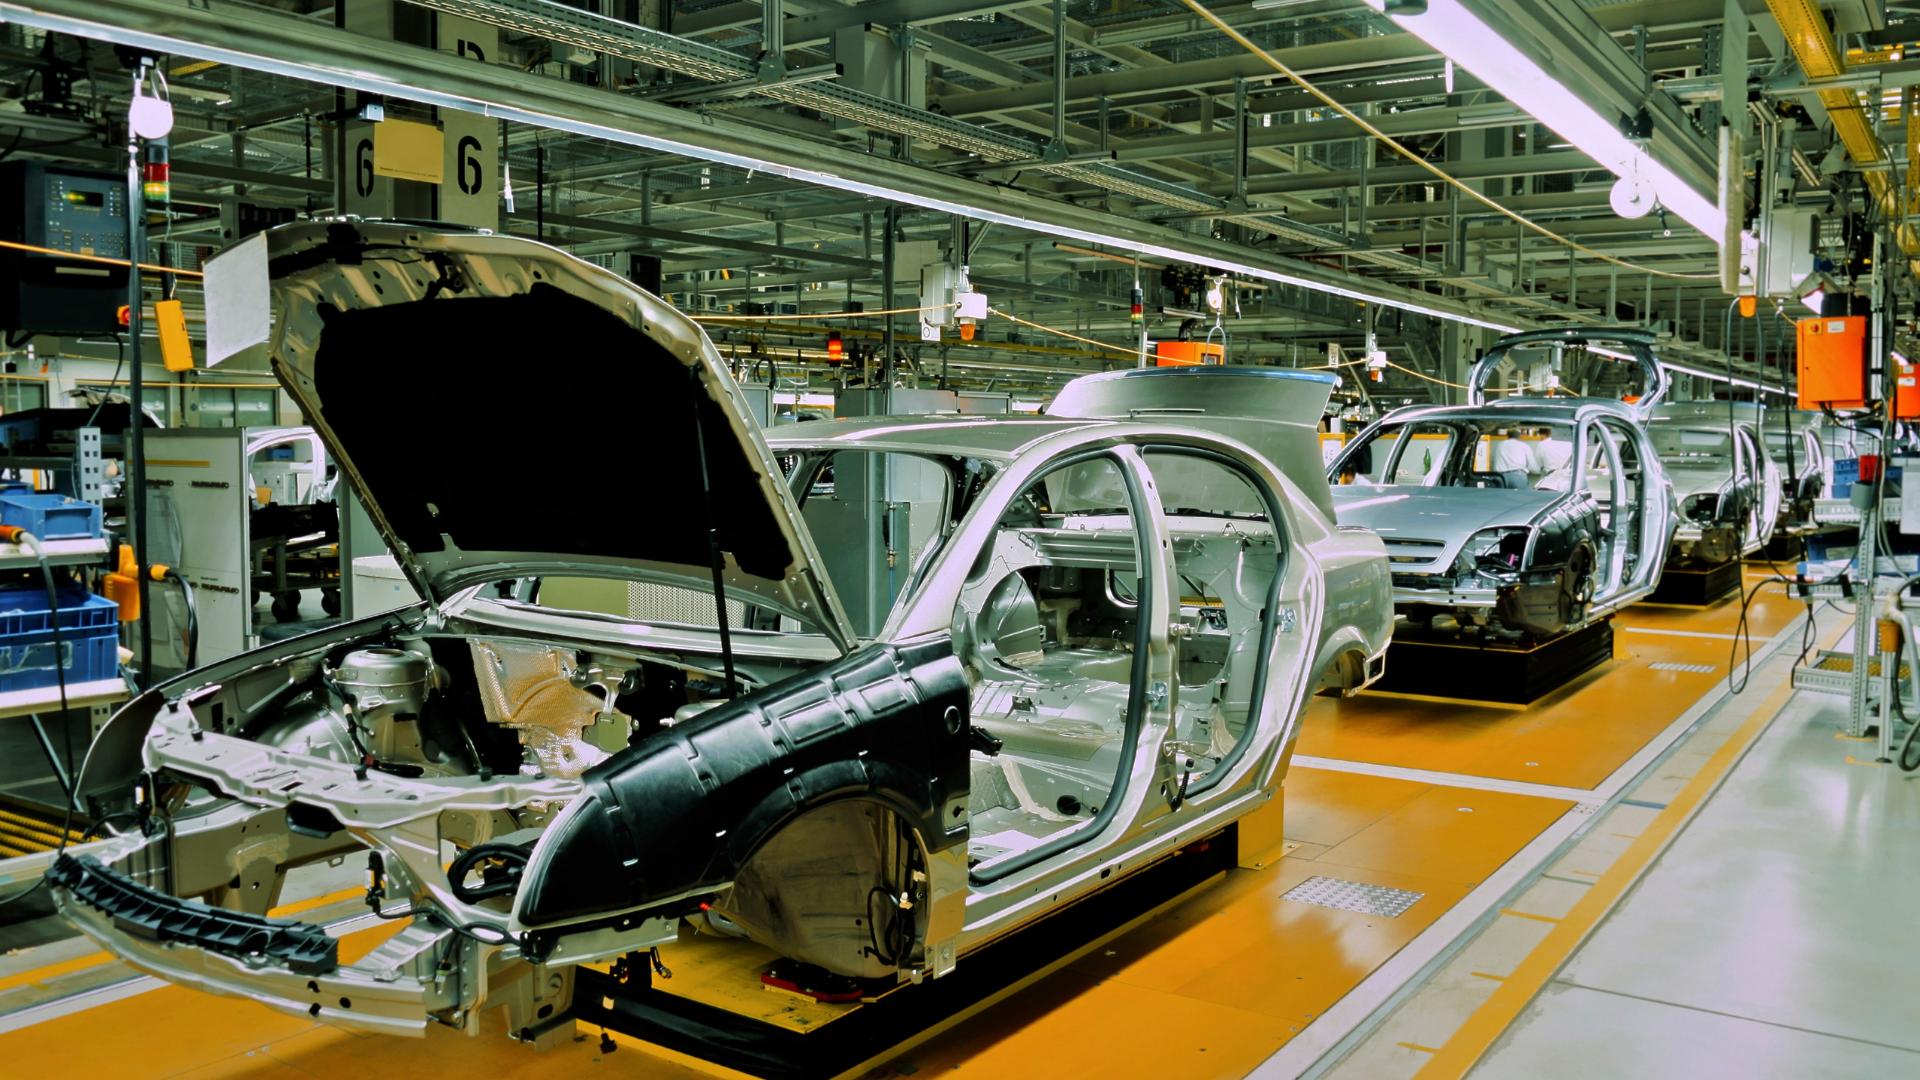 【Shizuoka, Makinohara】 Job at a major automobile manufacturing plant with dormitory provided!